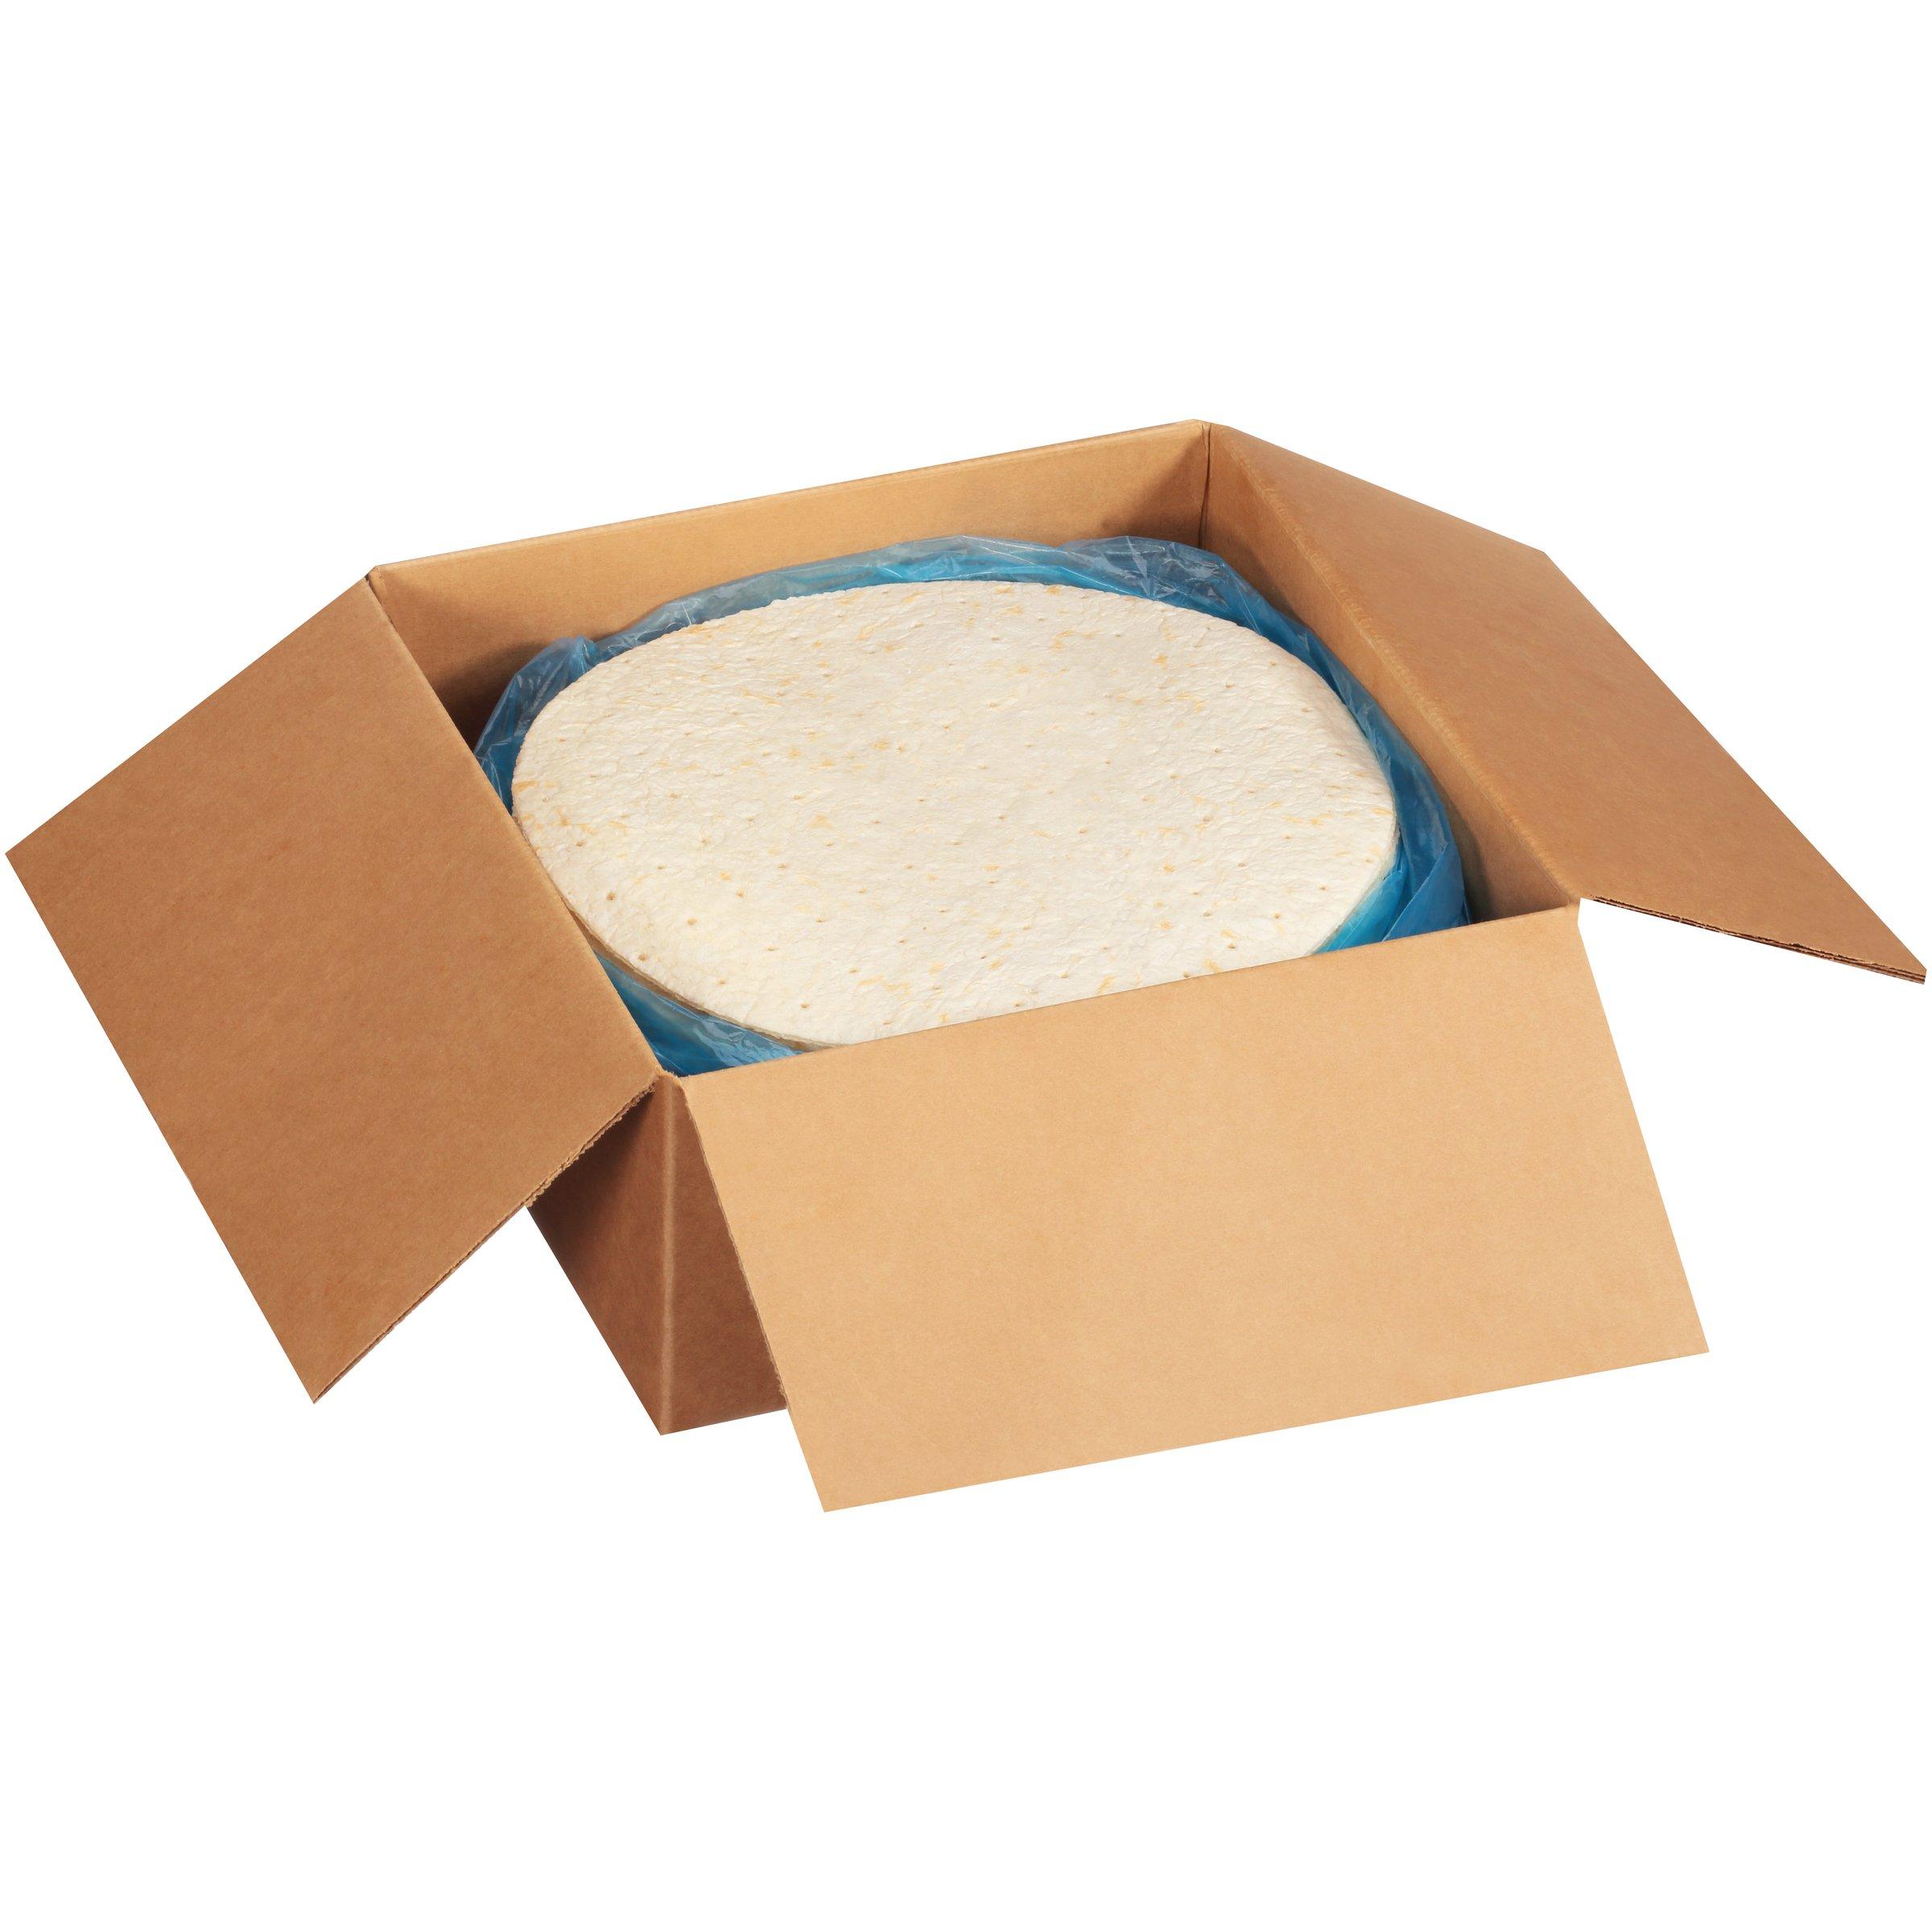 Bonici Thin Pizza Crust, 14 inch, 21.25 lb by Bonici (Image #2)